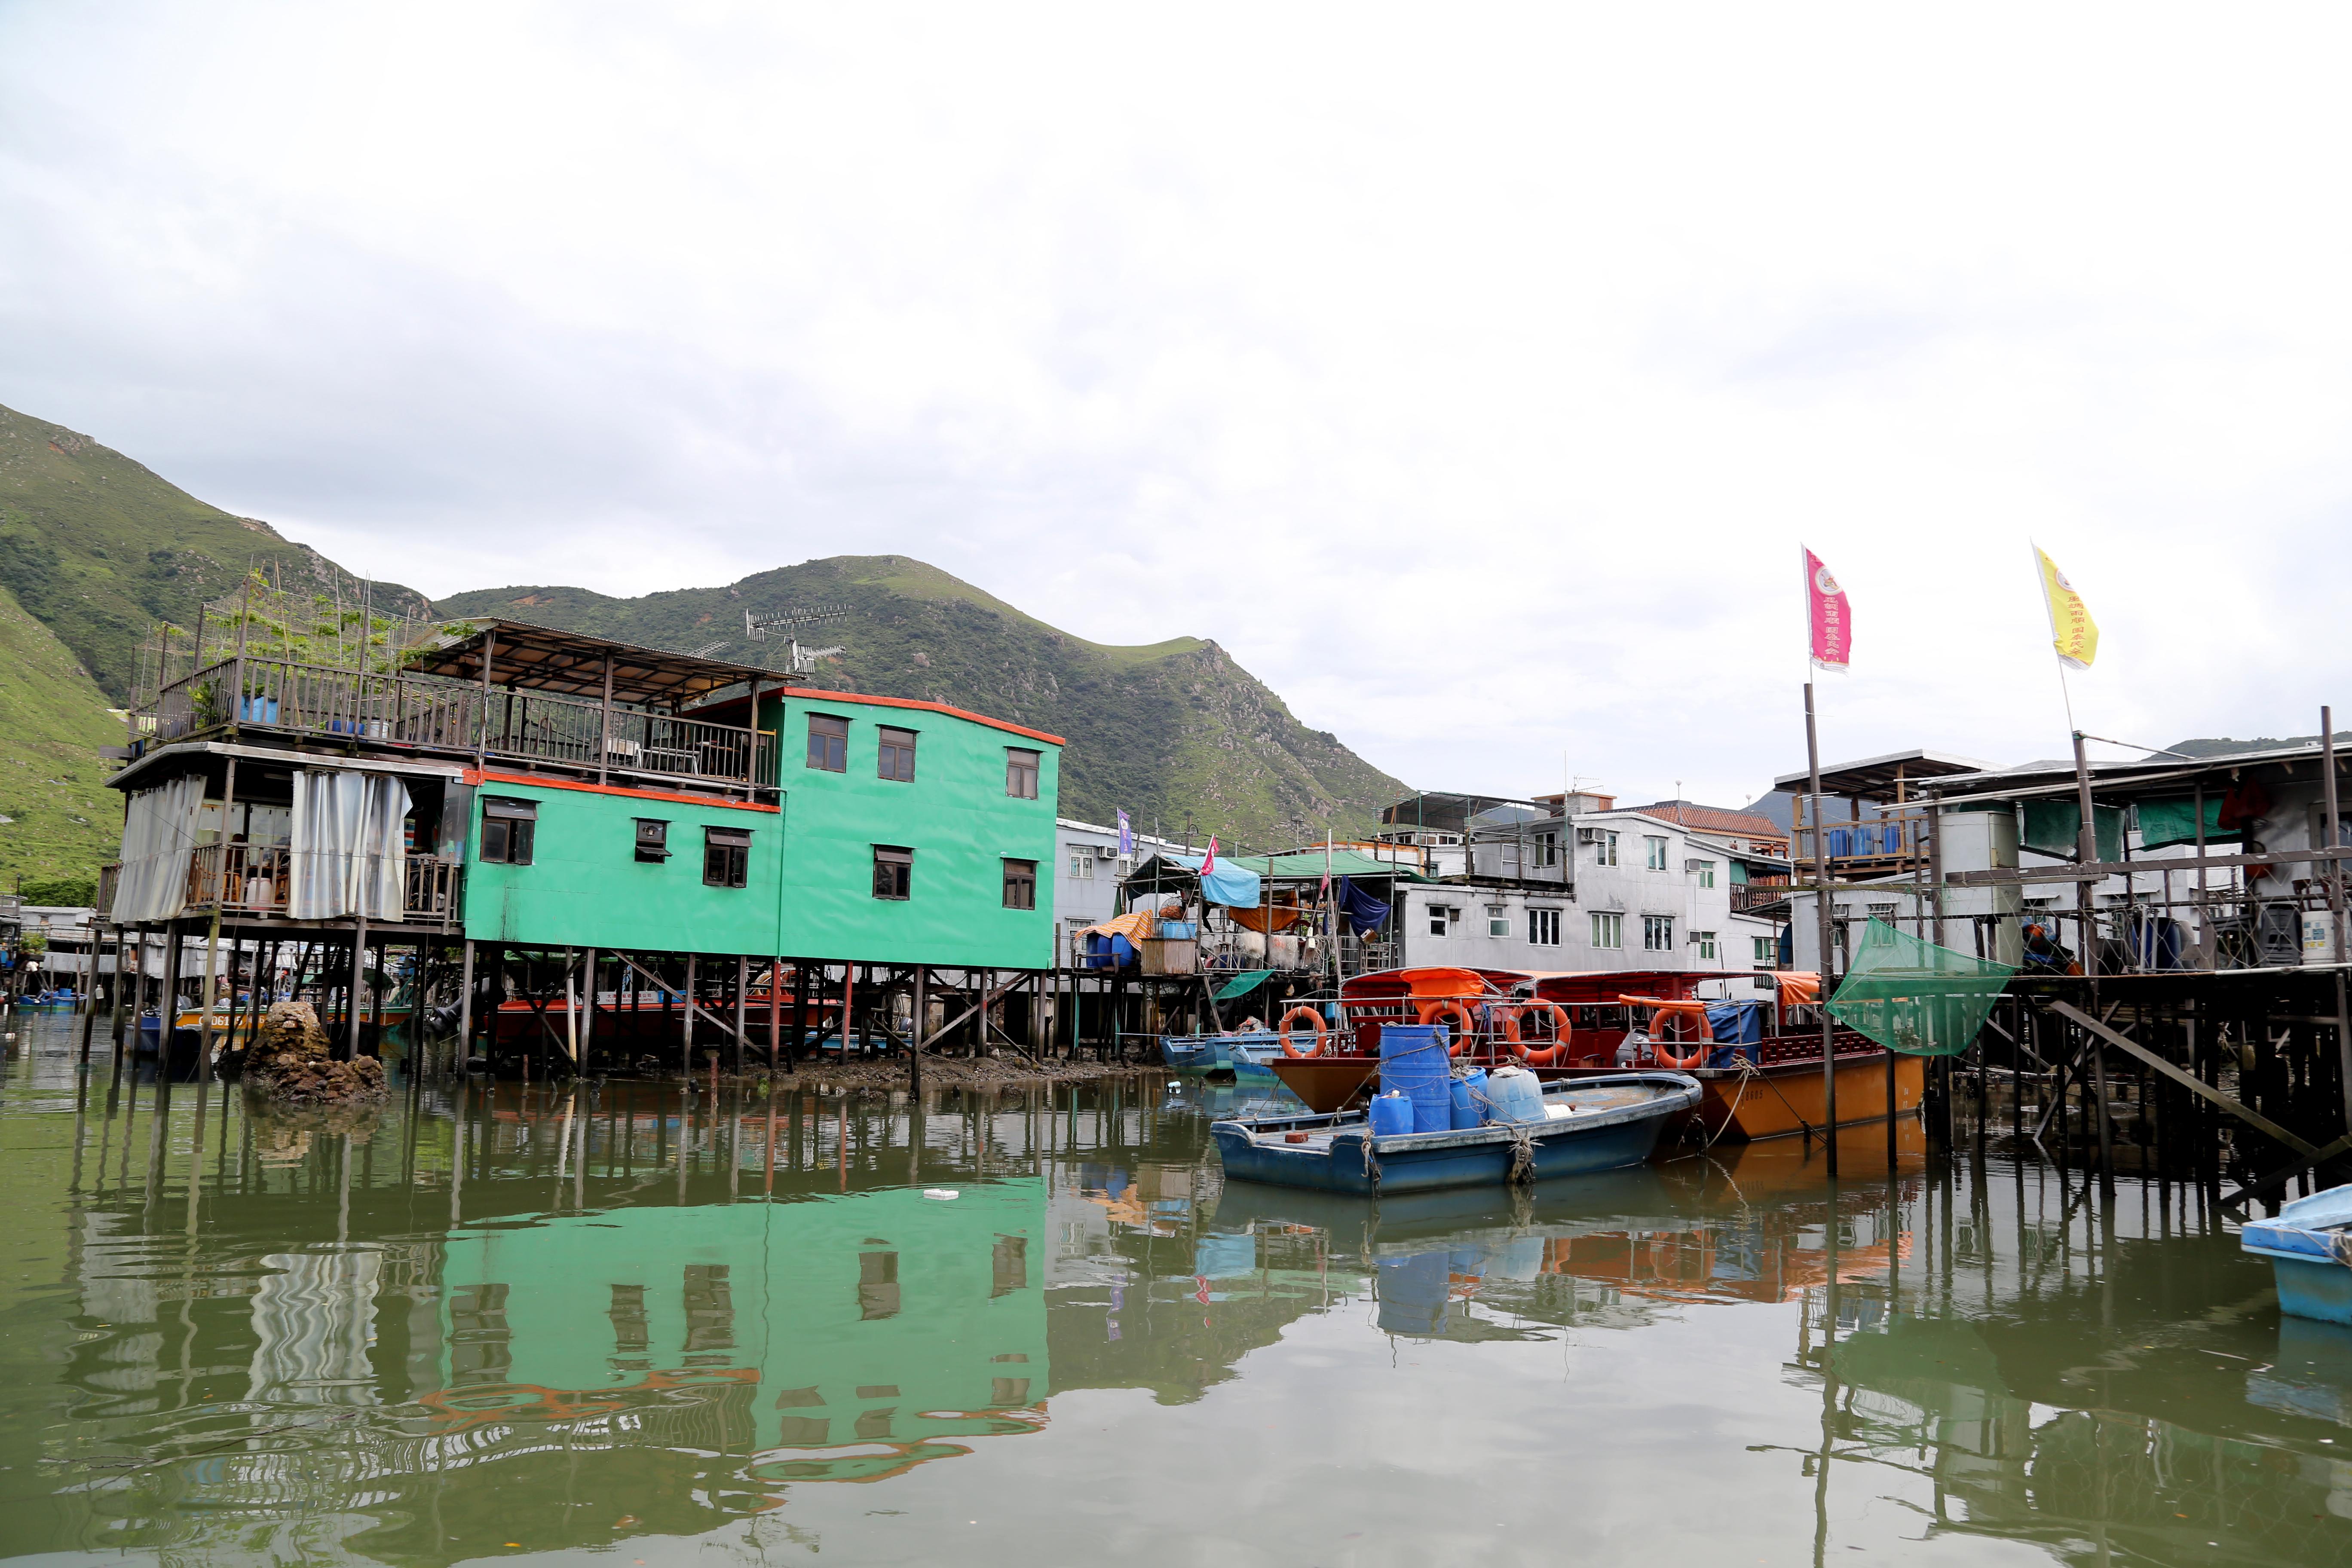 Tai O fishing Village and Dolphin cruise at Lantau Island